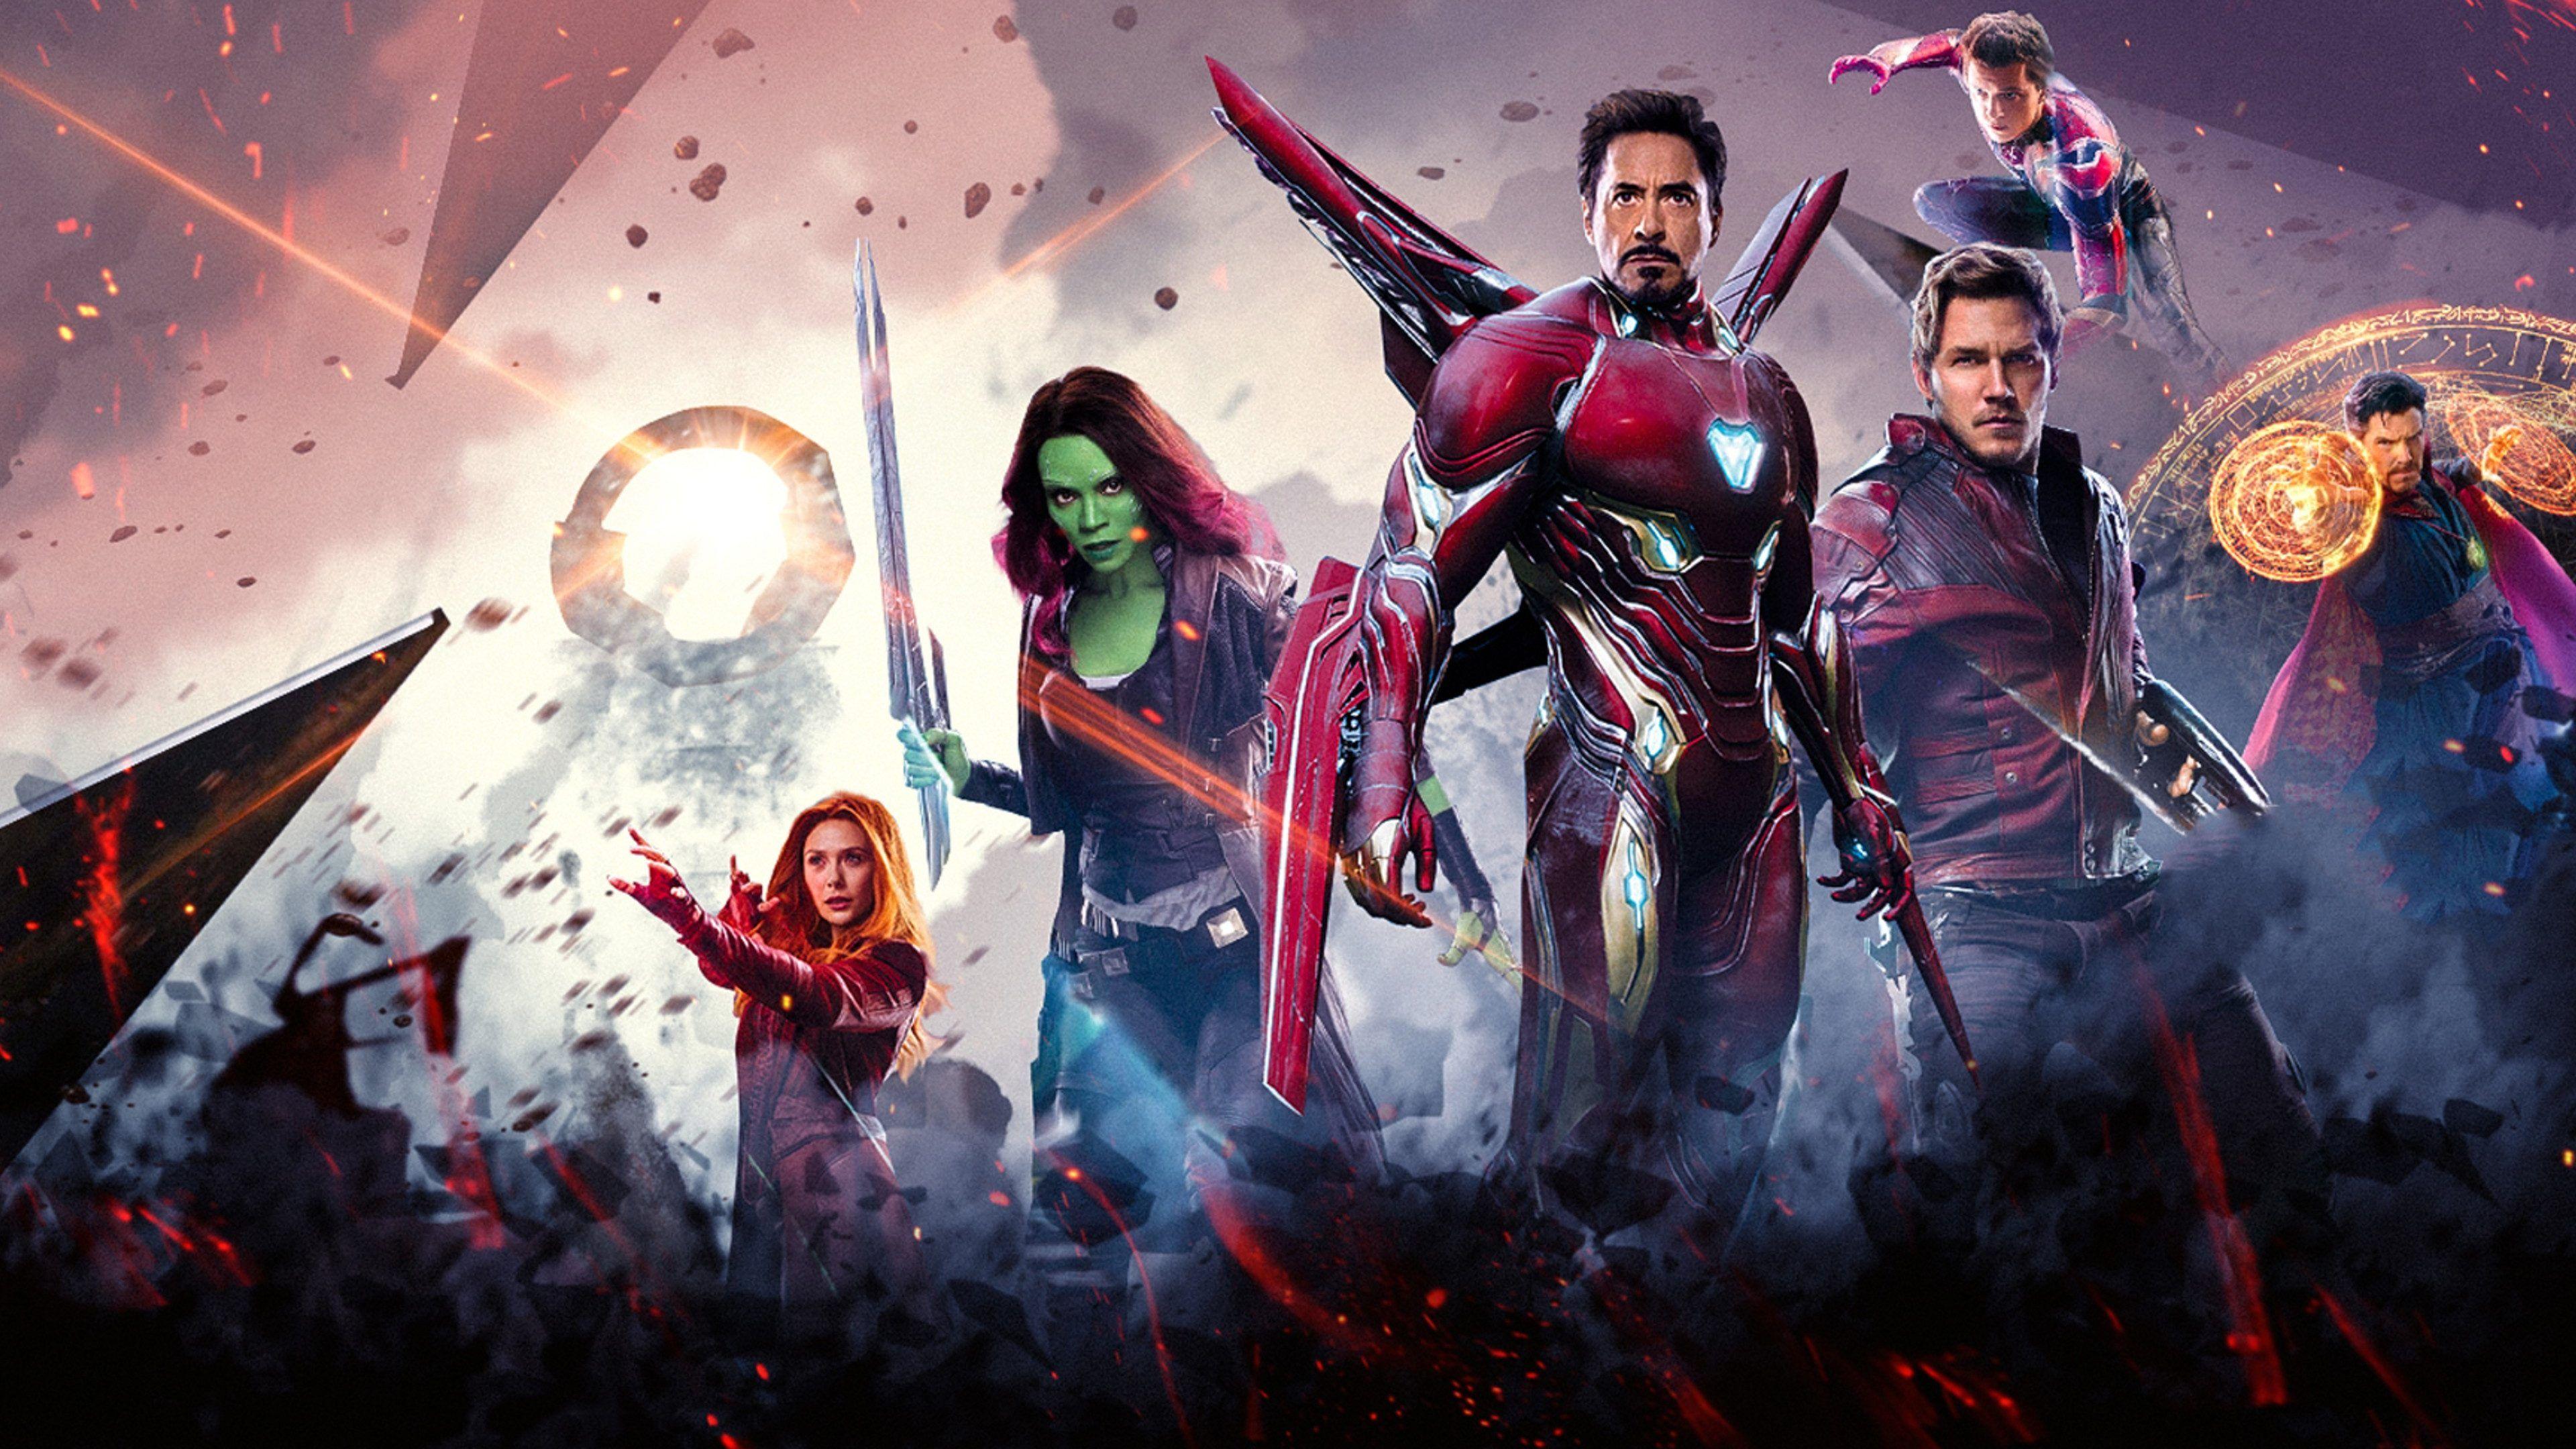 Super Heroes In Avengers Infinity War 4k Wallpaper Avengers Infinity War Avengers Pictures Avengers